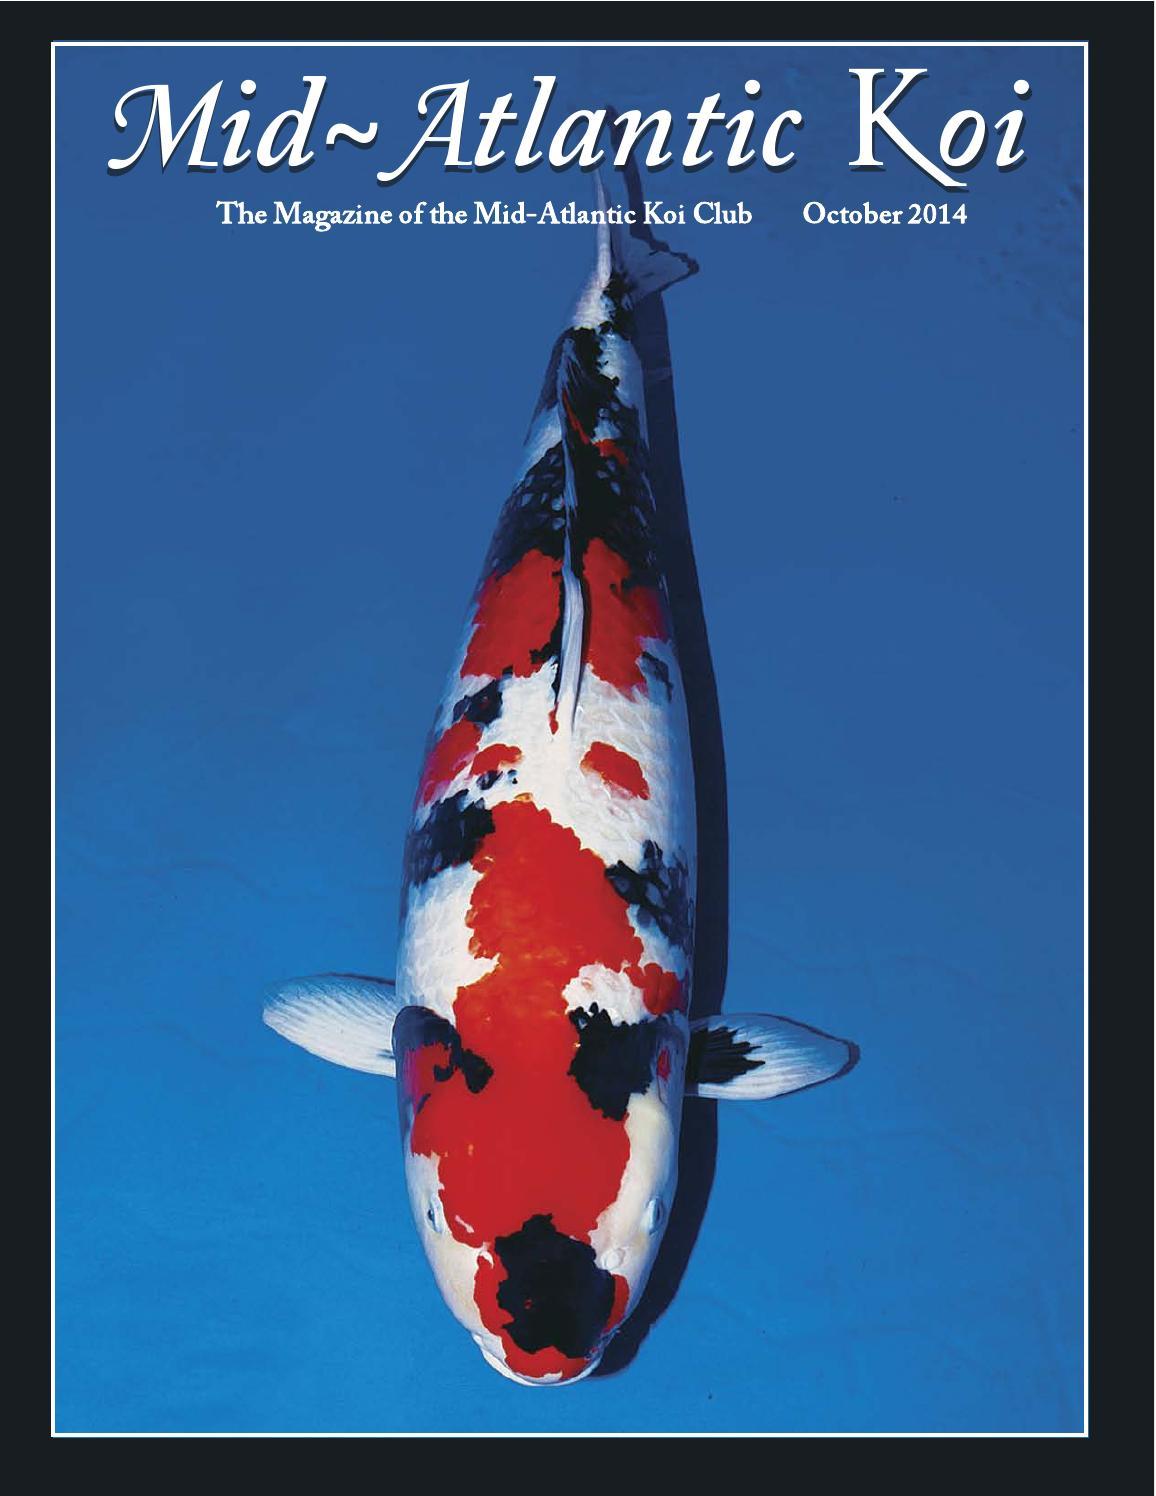 Mid atlantic koi magazine october 2014 by cindy graham issuu for Koi new york